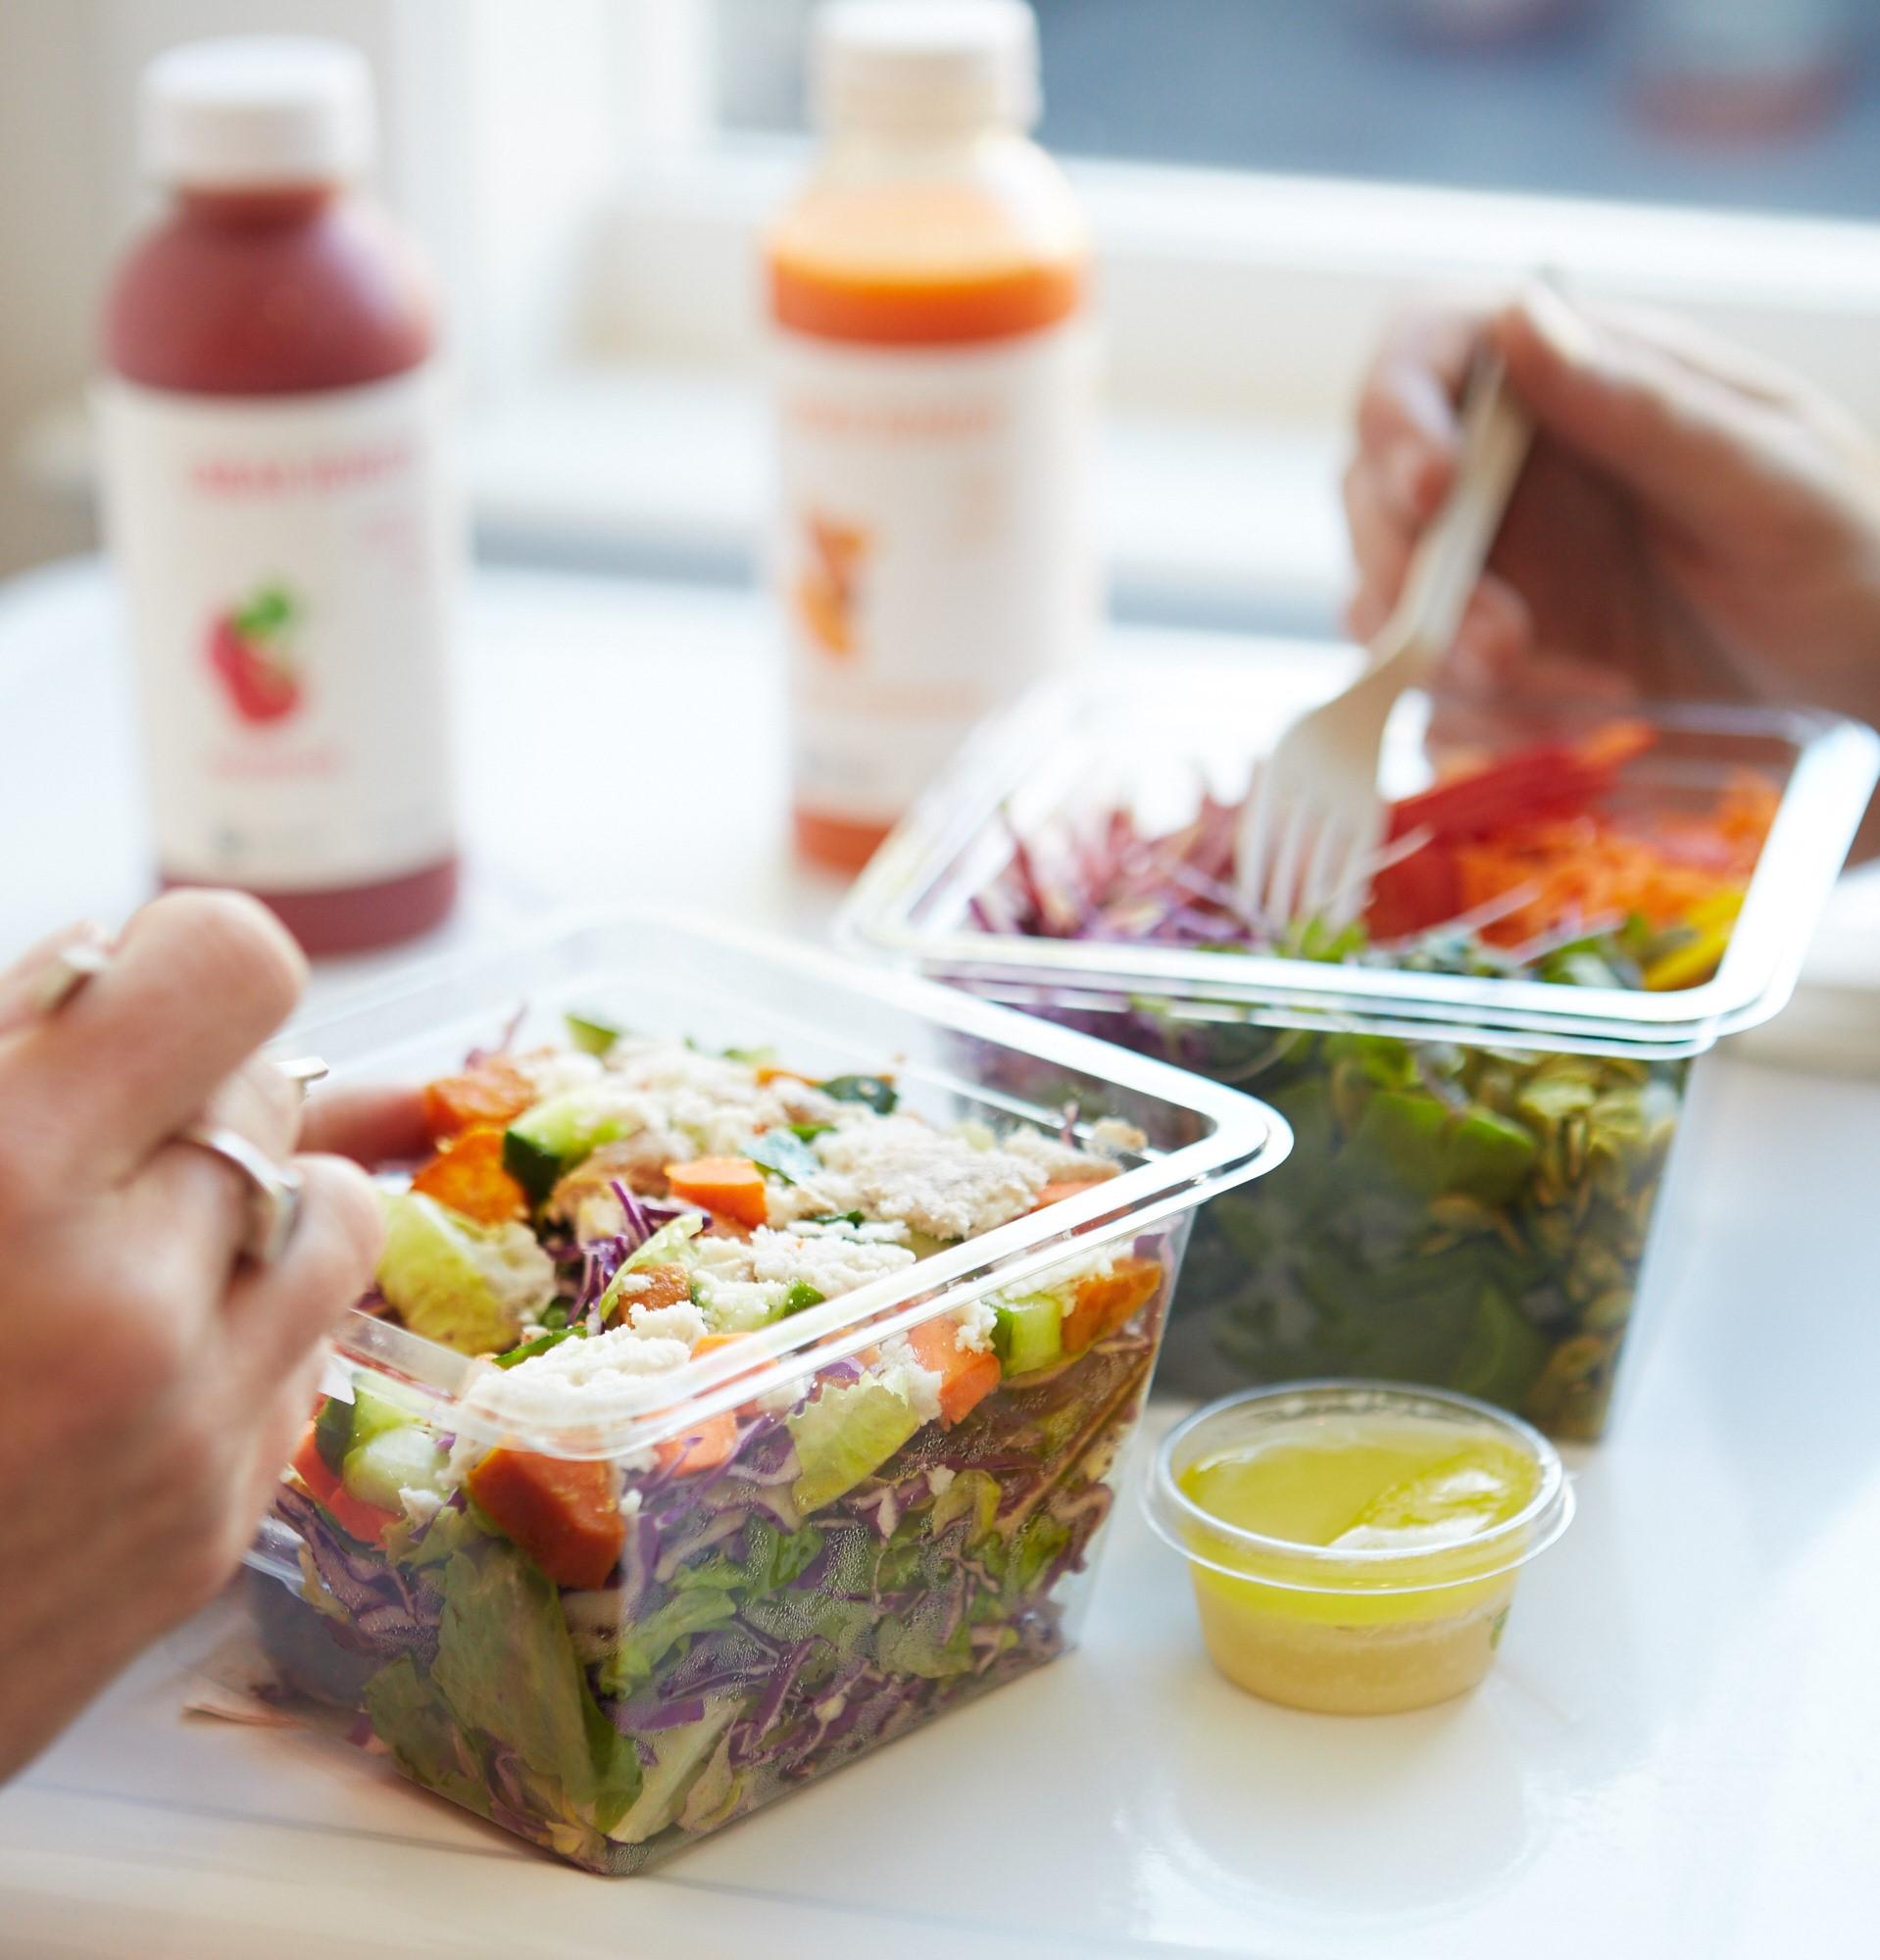 Salads at Urban Remedy